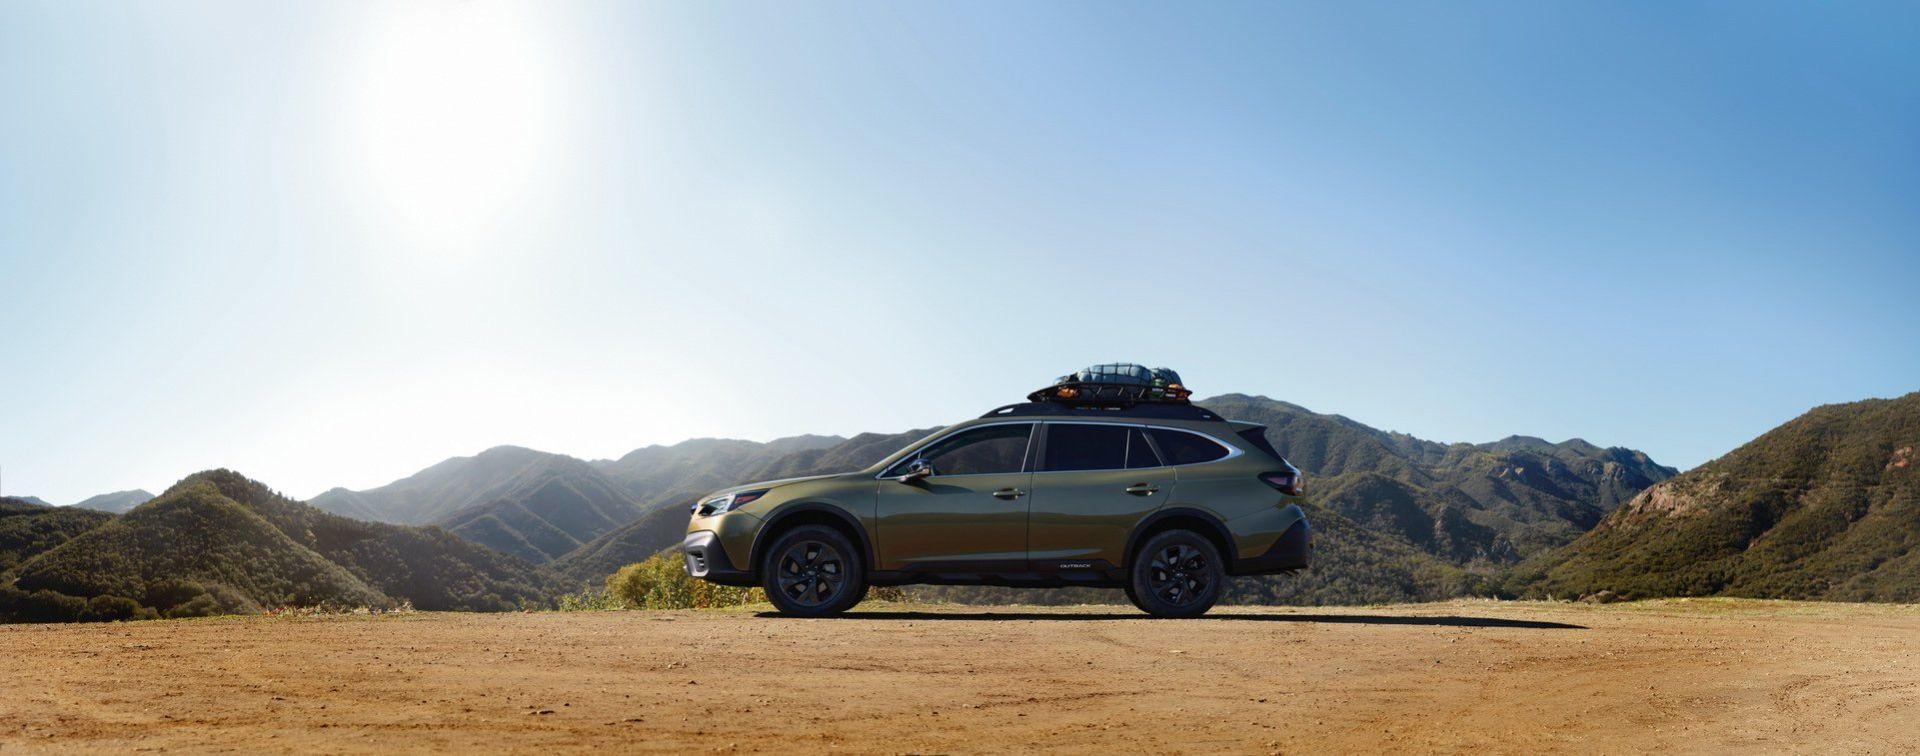 Nuevo Subaru Outback 2019 13